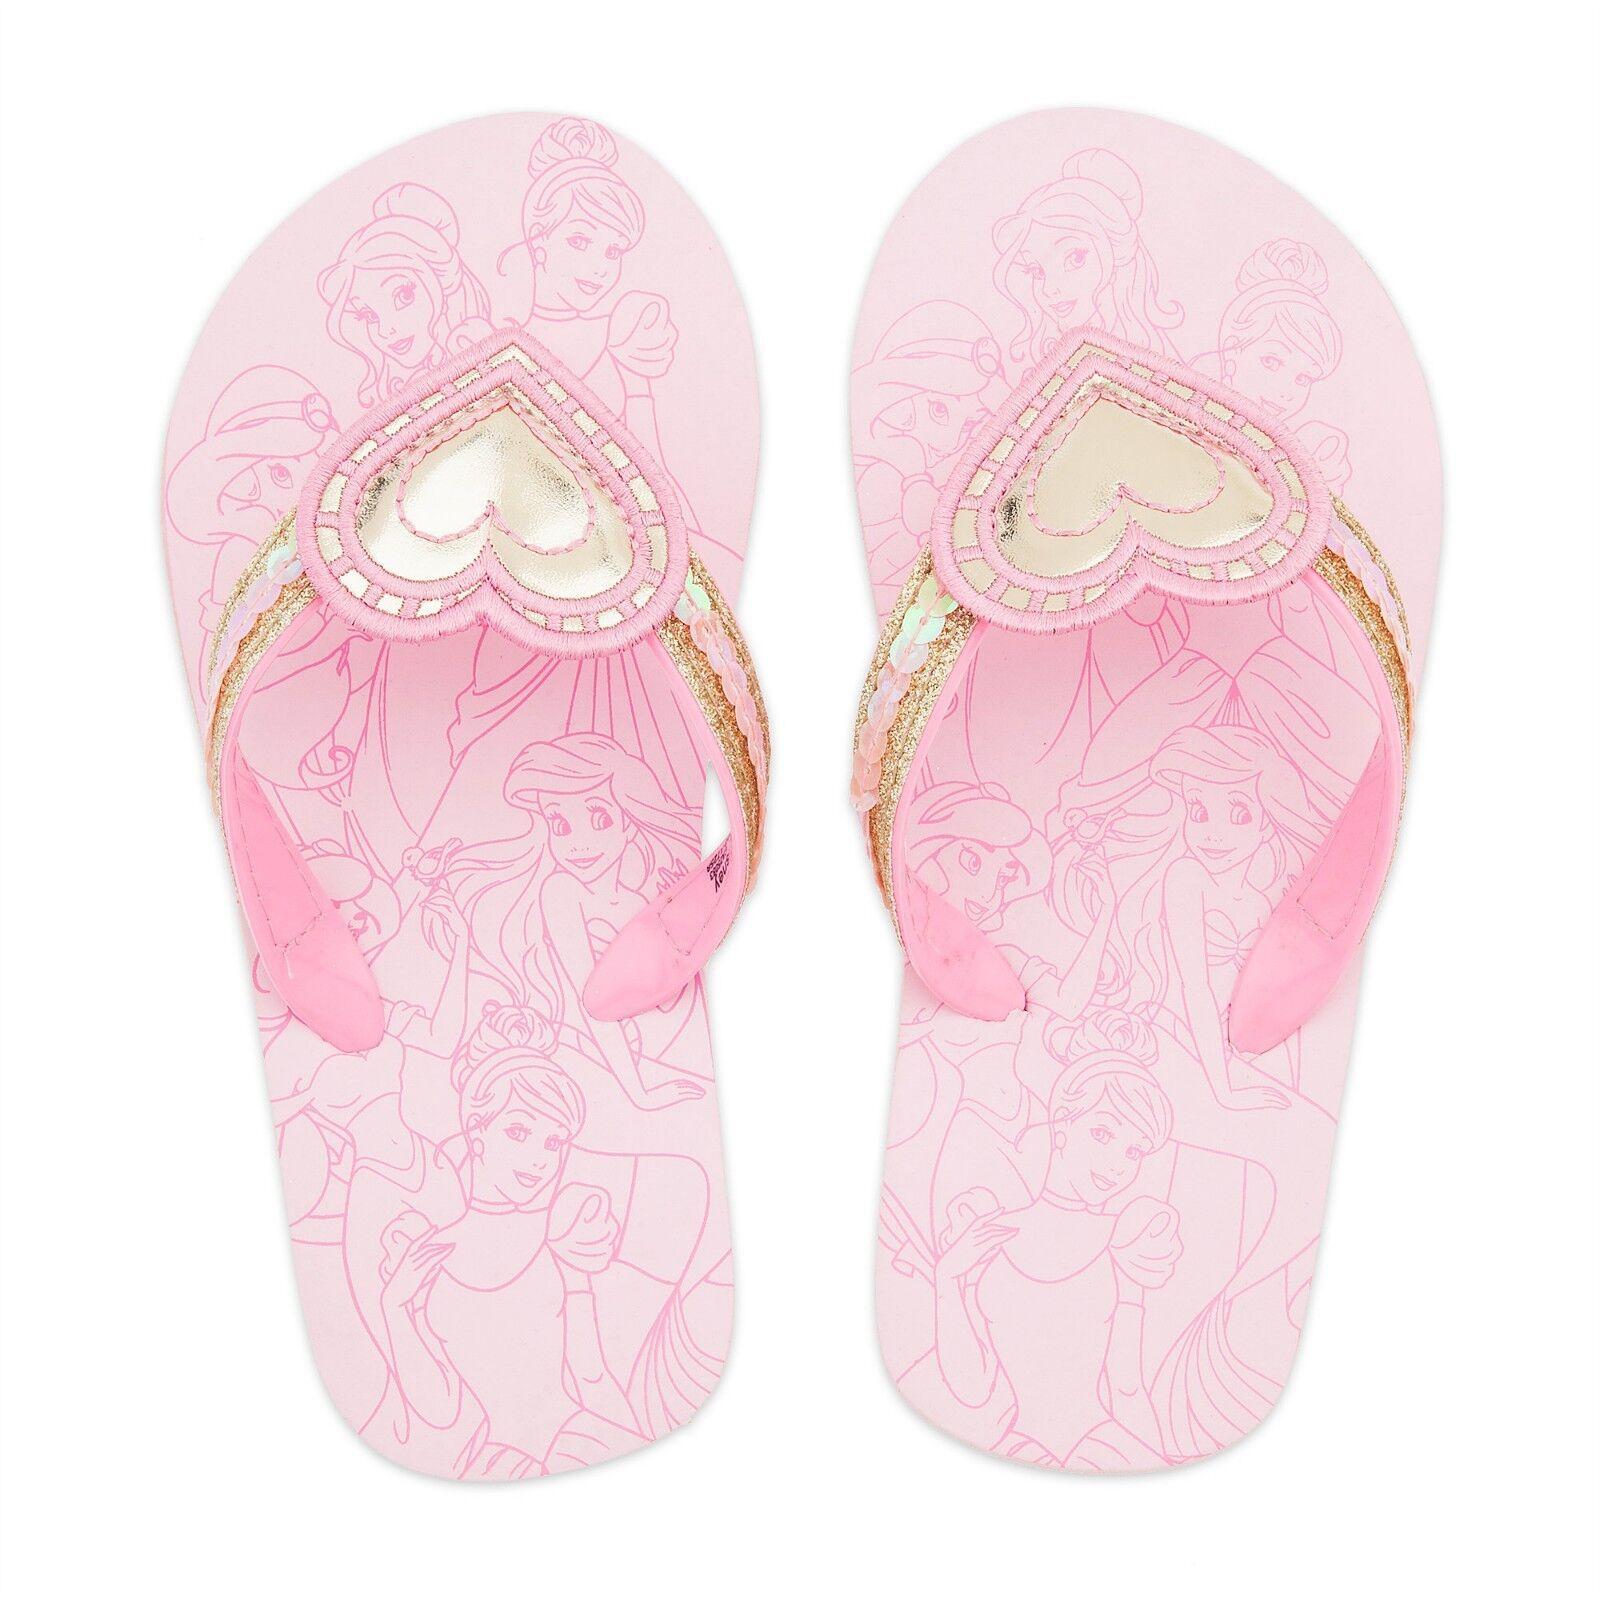 Toddler or Child Disney Store Princess Flip Flops Size 7/8 9